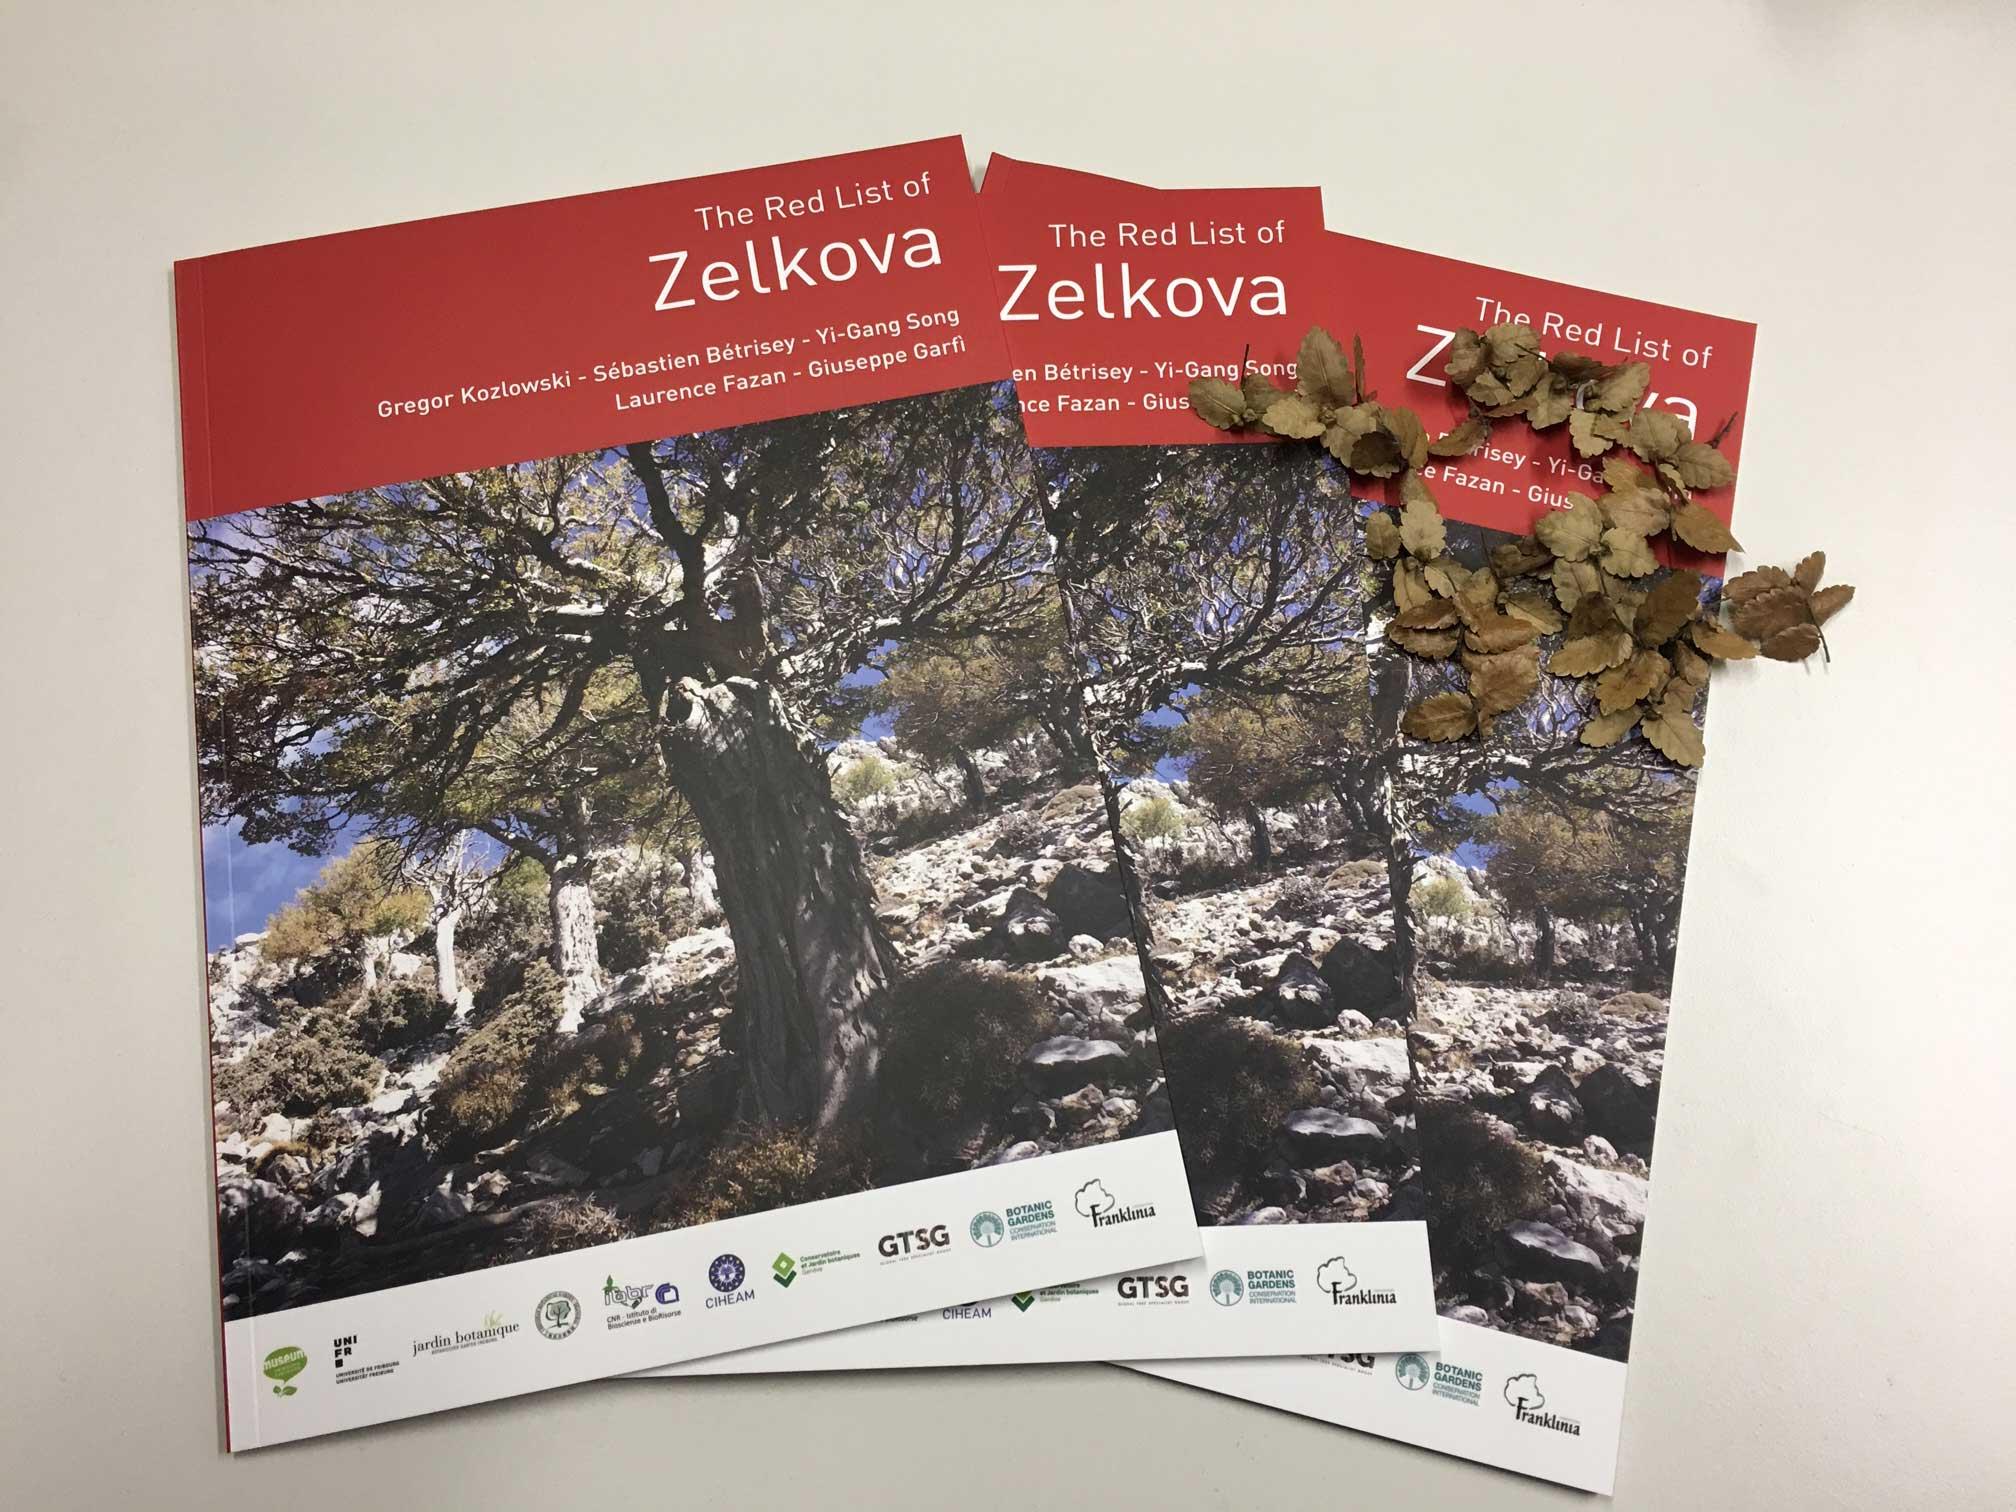 The Red List of Zelkova 2019